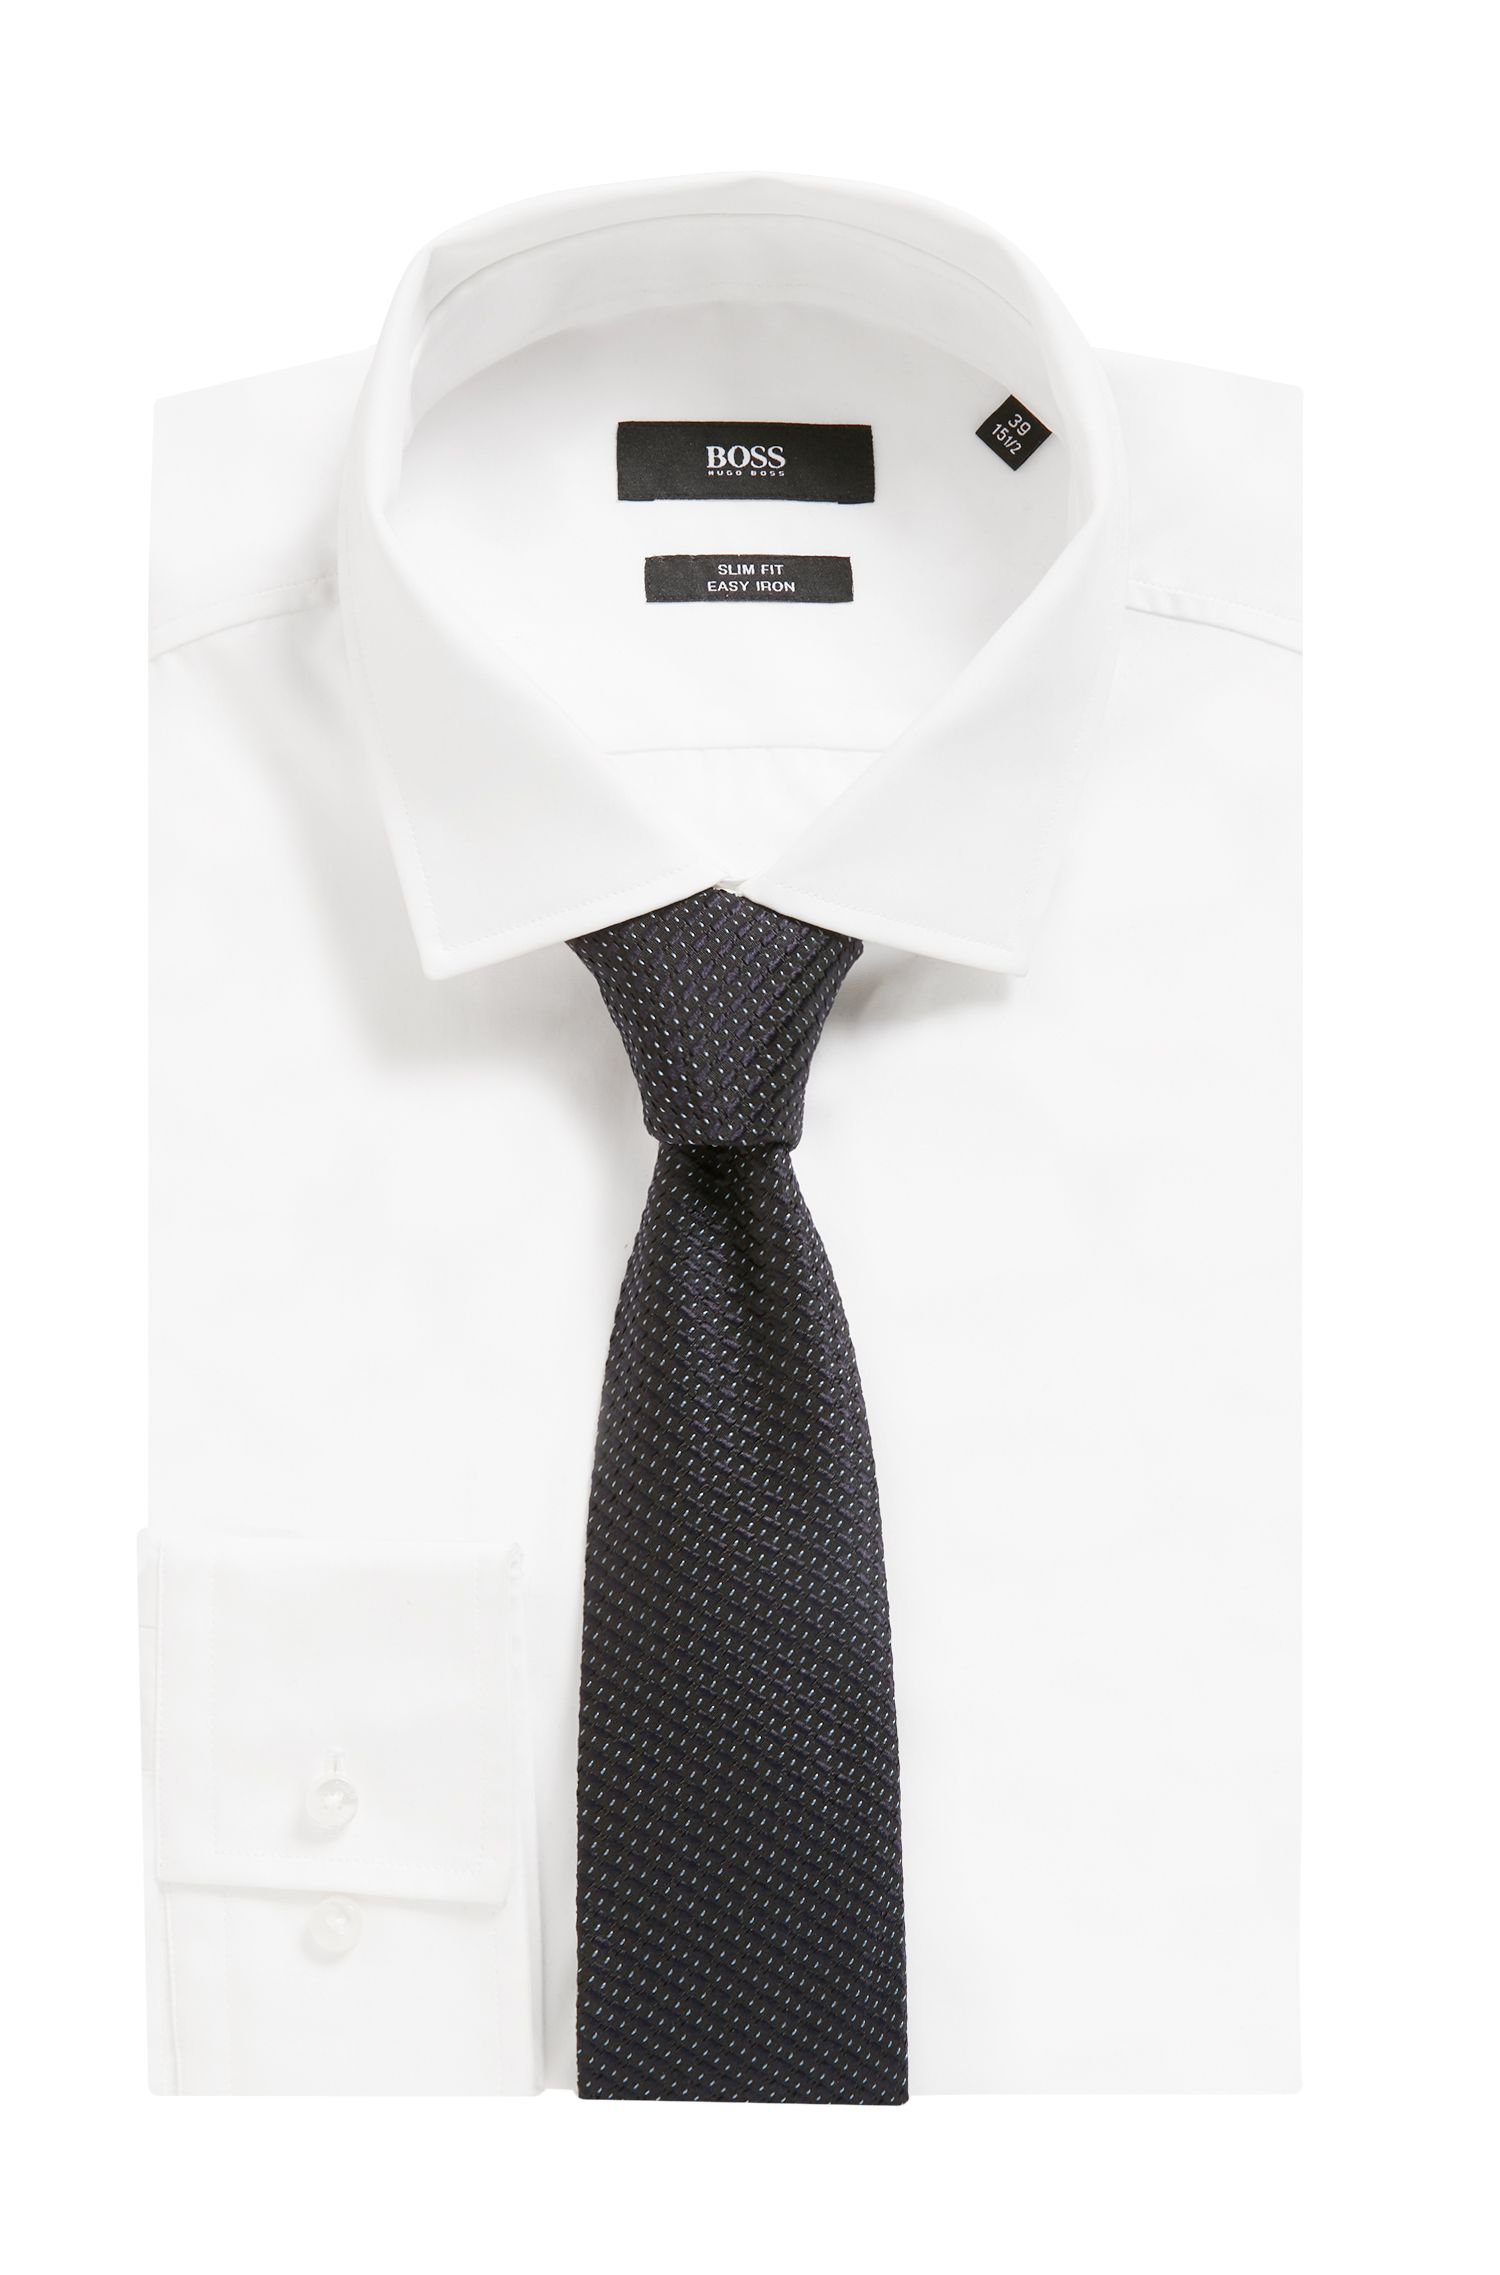 Micro-pattern silk tie handmade in Italy, Patterned